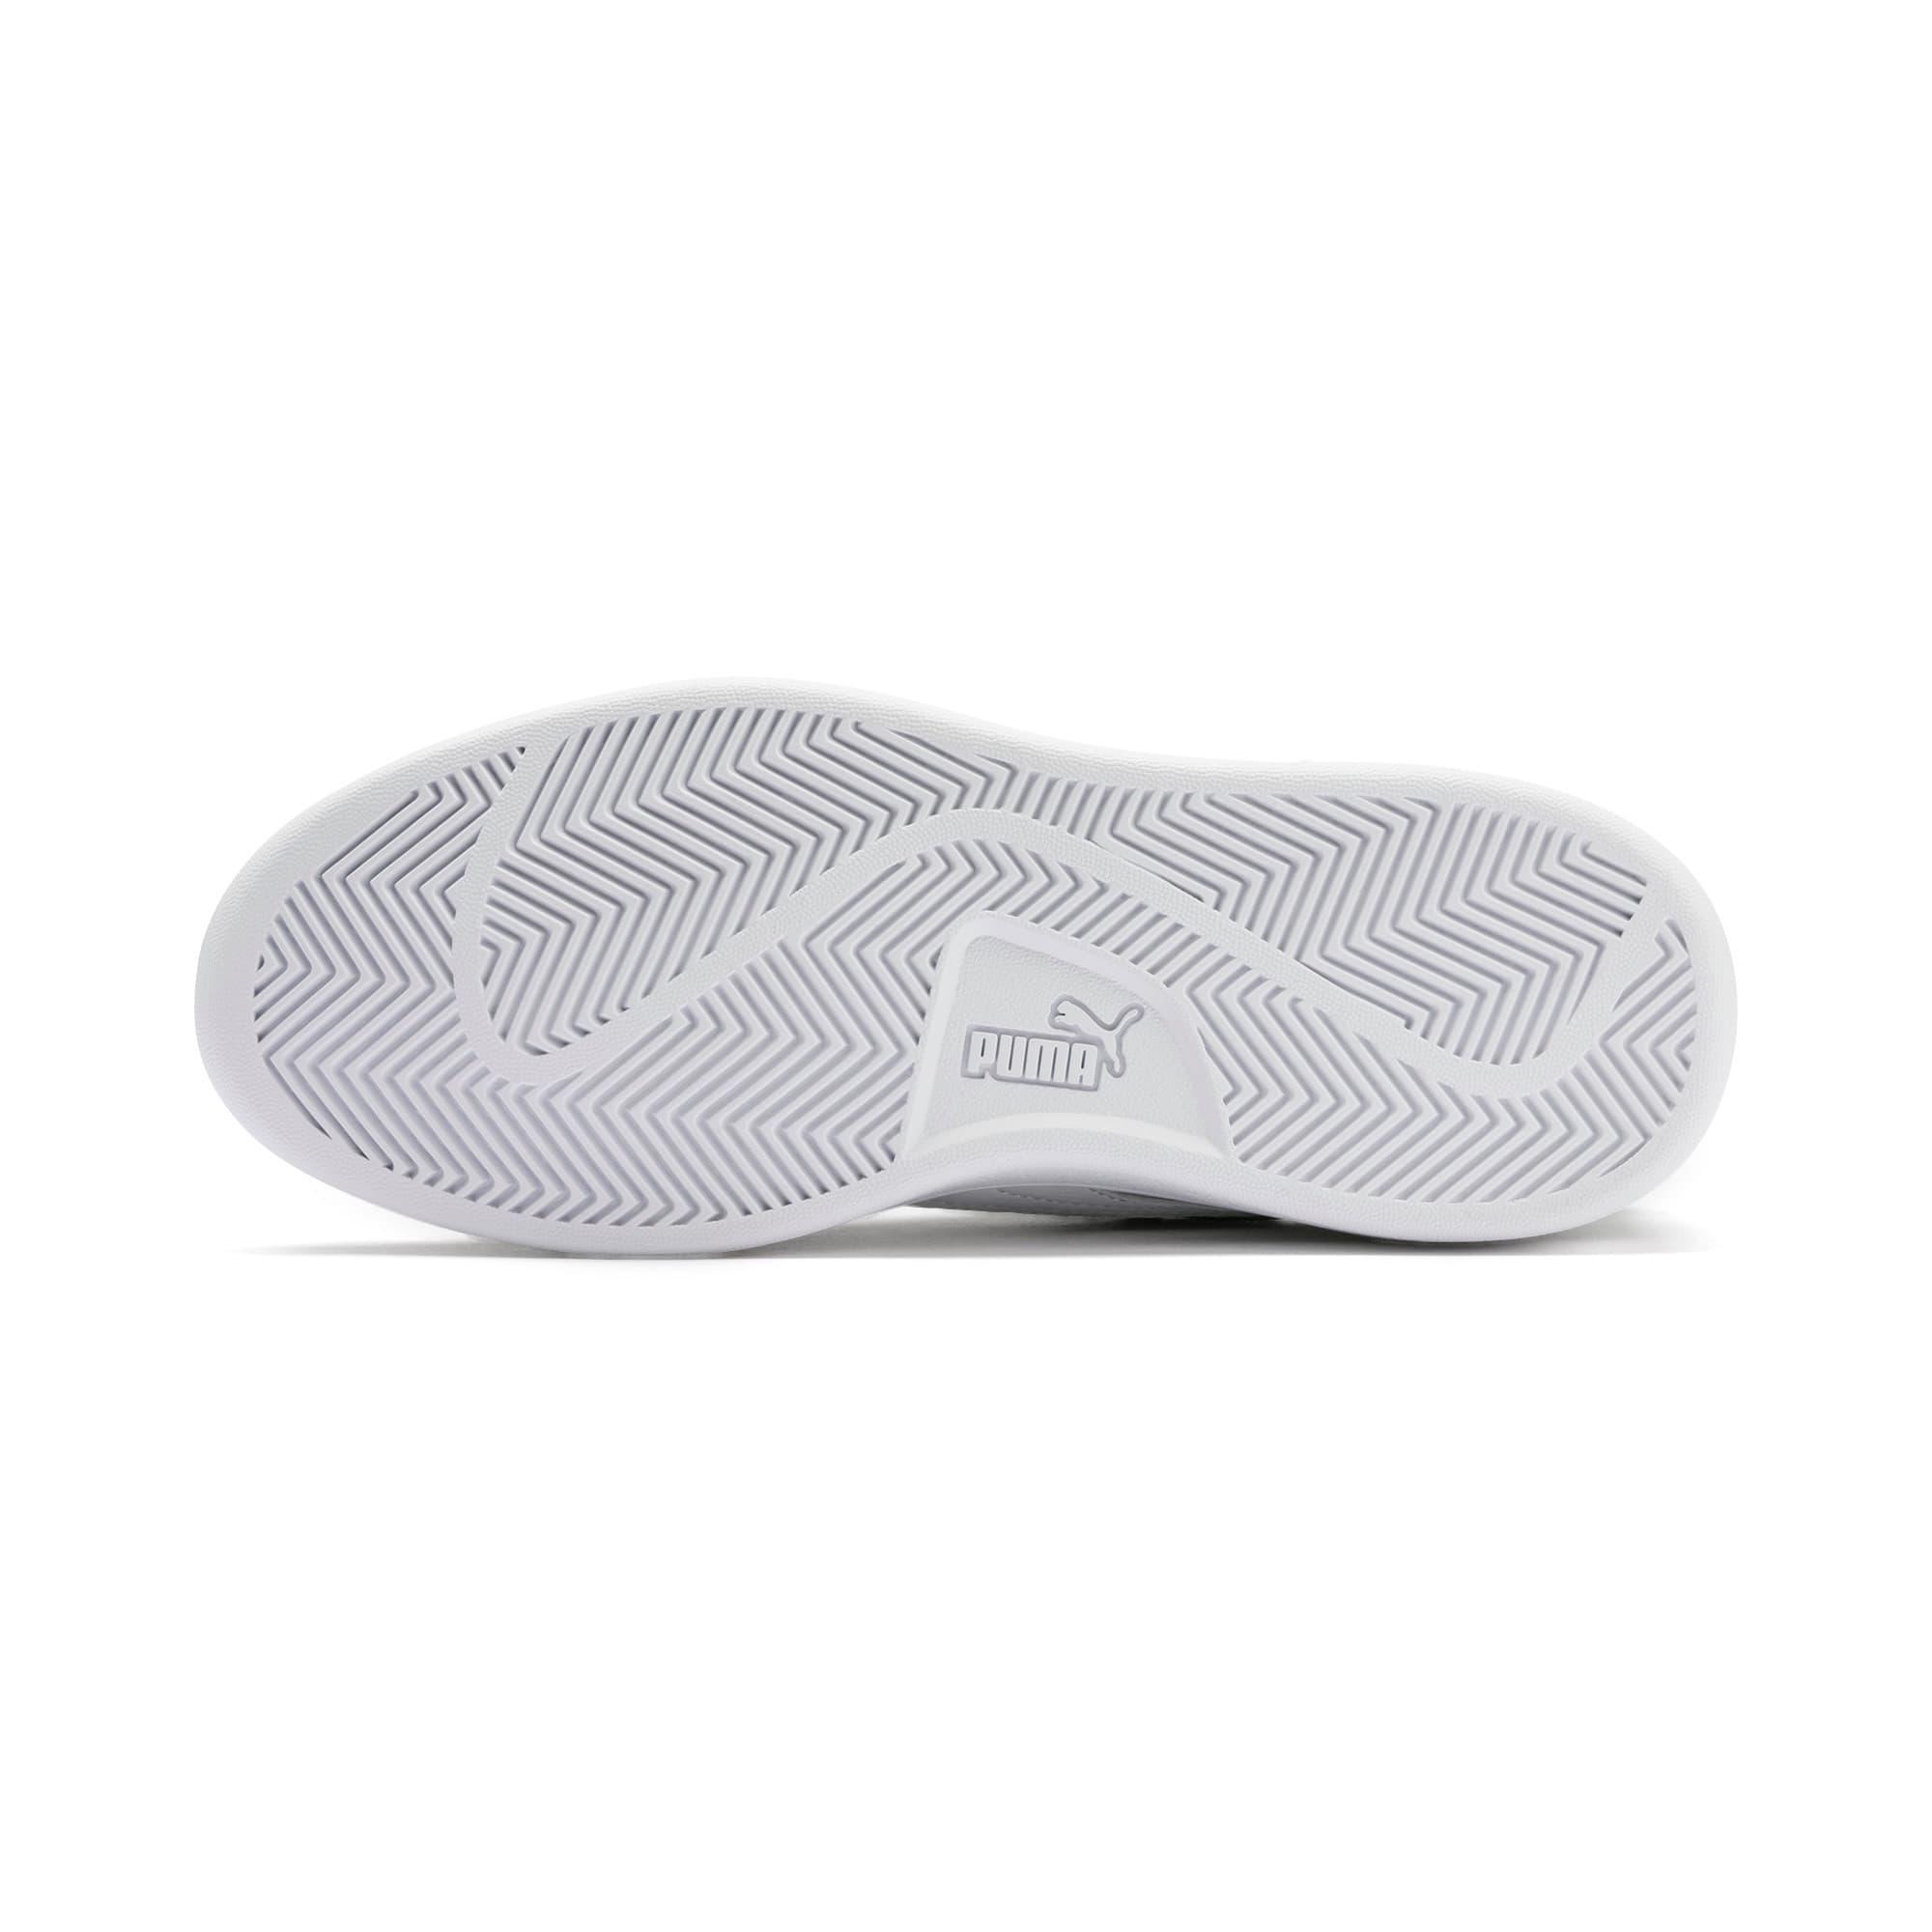 Thumbnail 4 of Astro Kick Sneakers JR, HRise-White-Gold-GViolet-Gum, medium